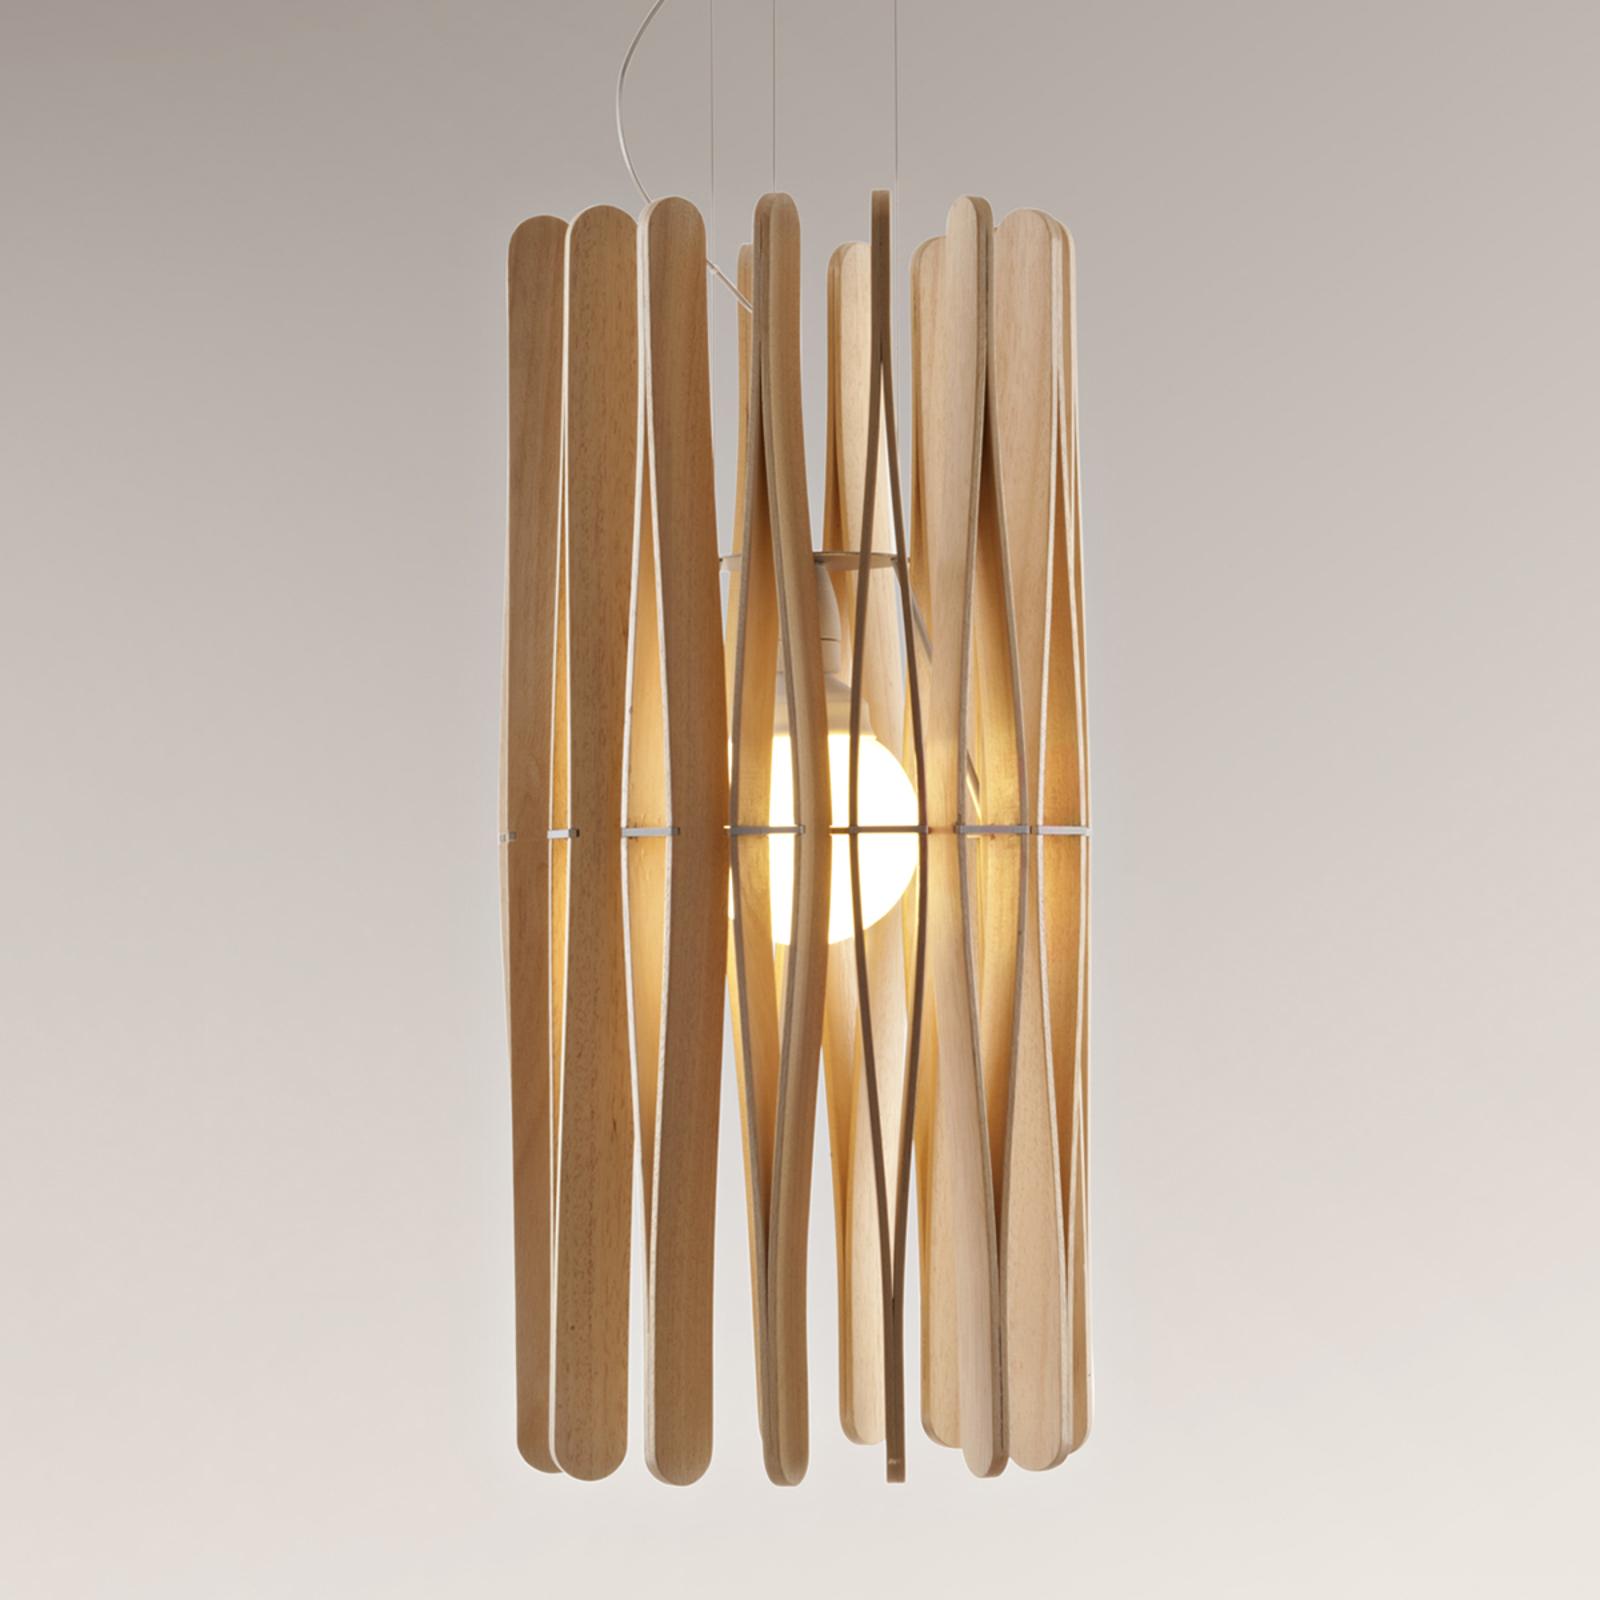 Fabbian Stick Holz-Hängeleuchte, zylindrisch, 33cm